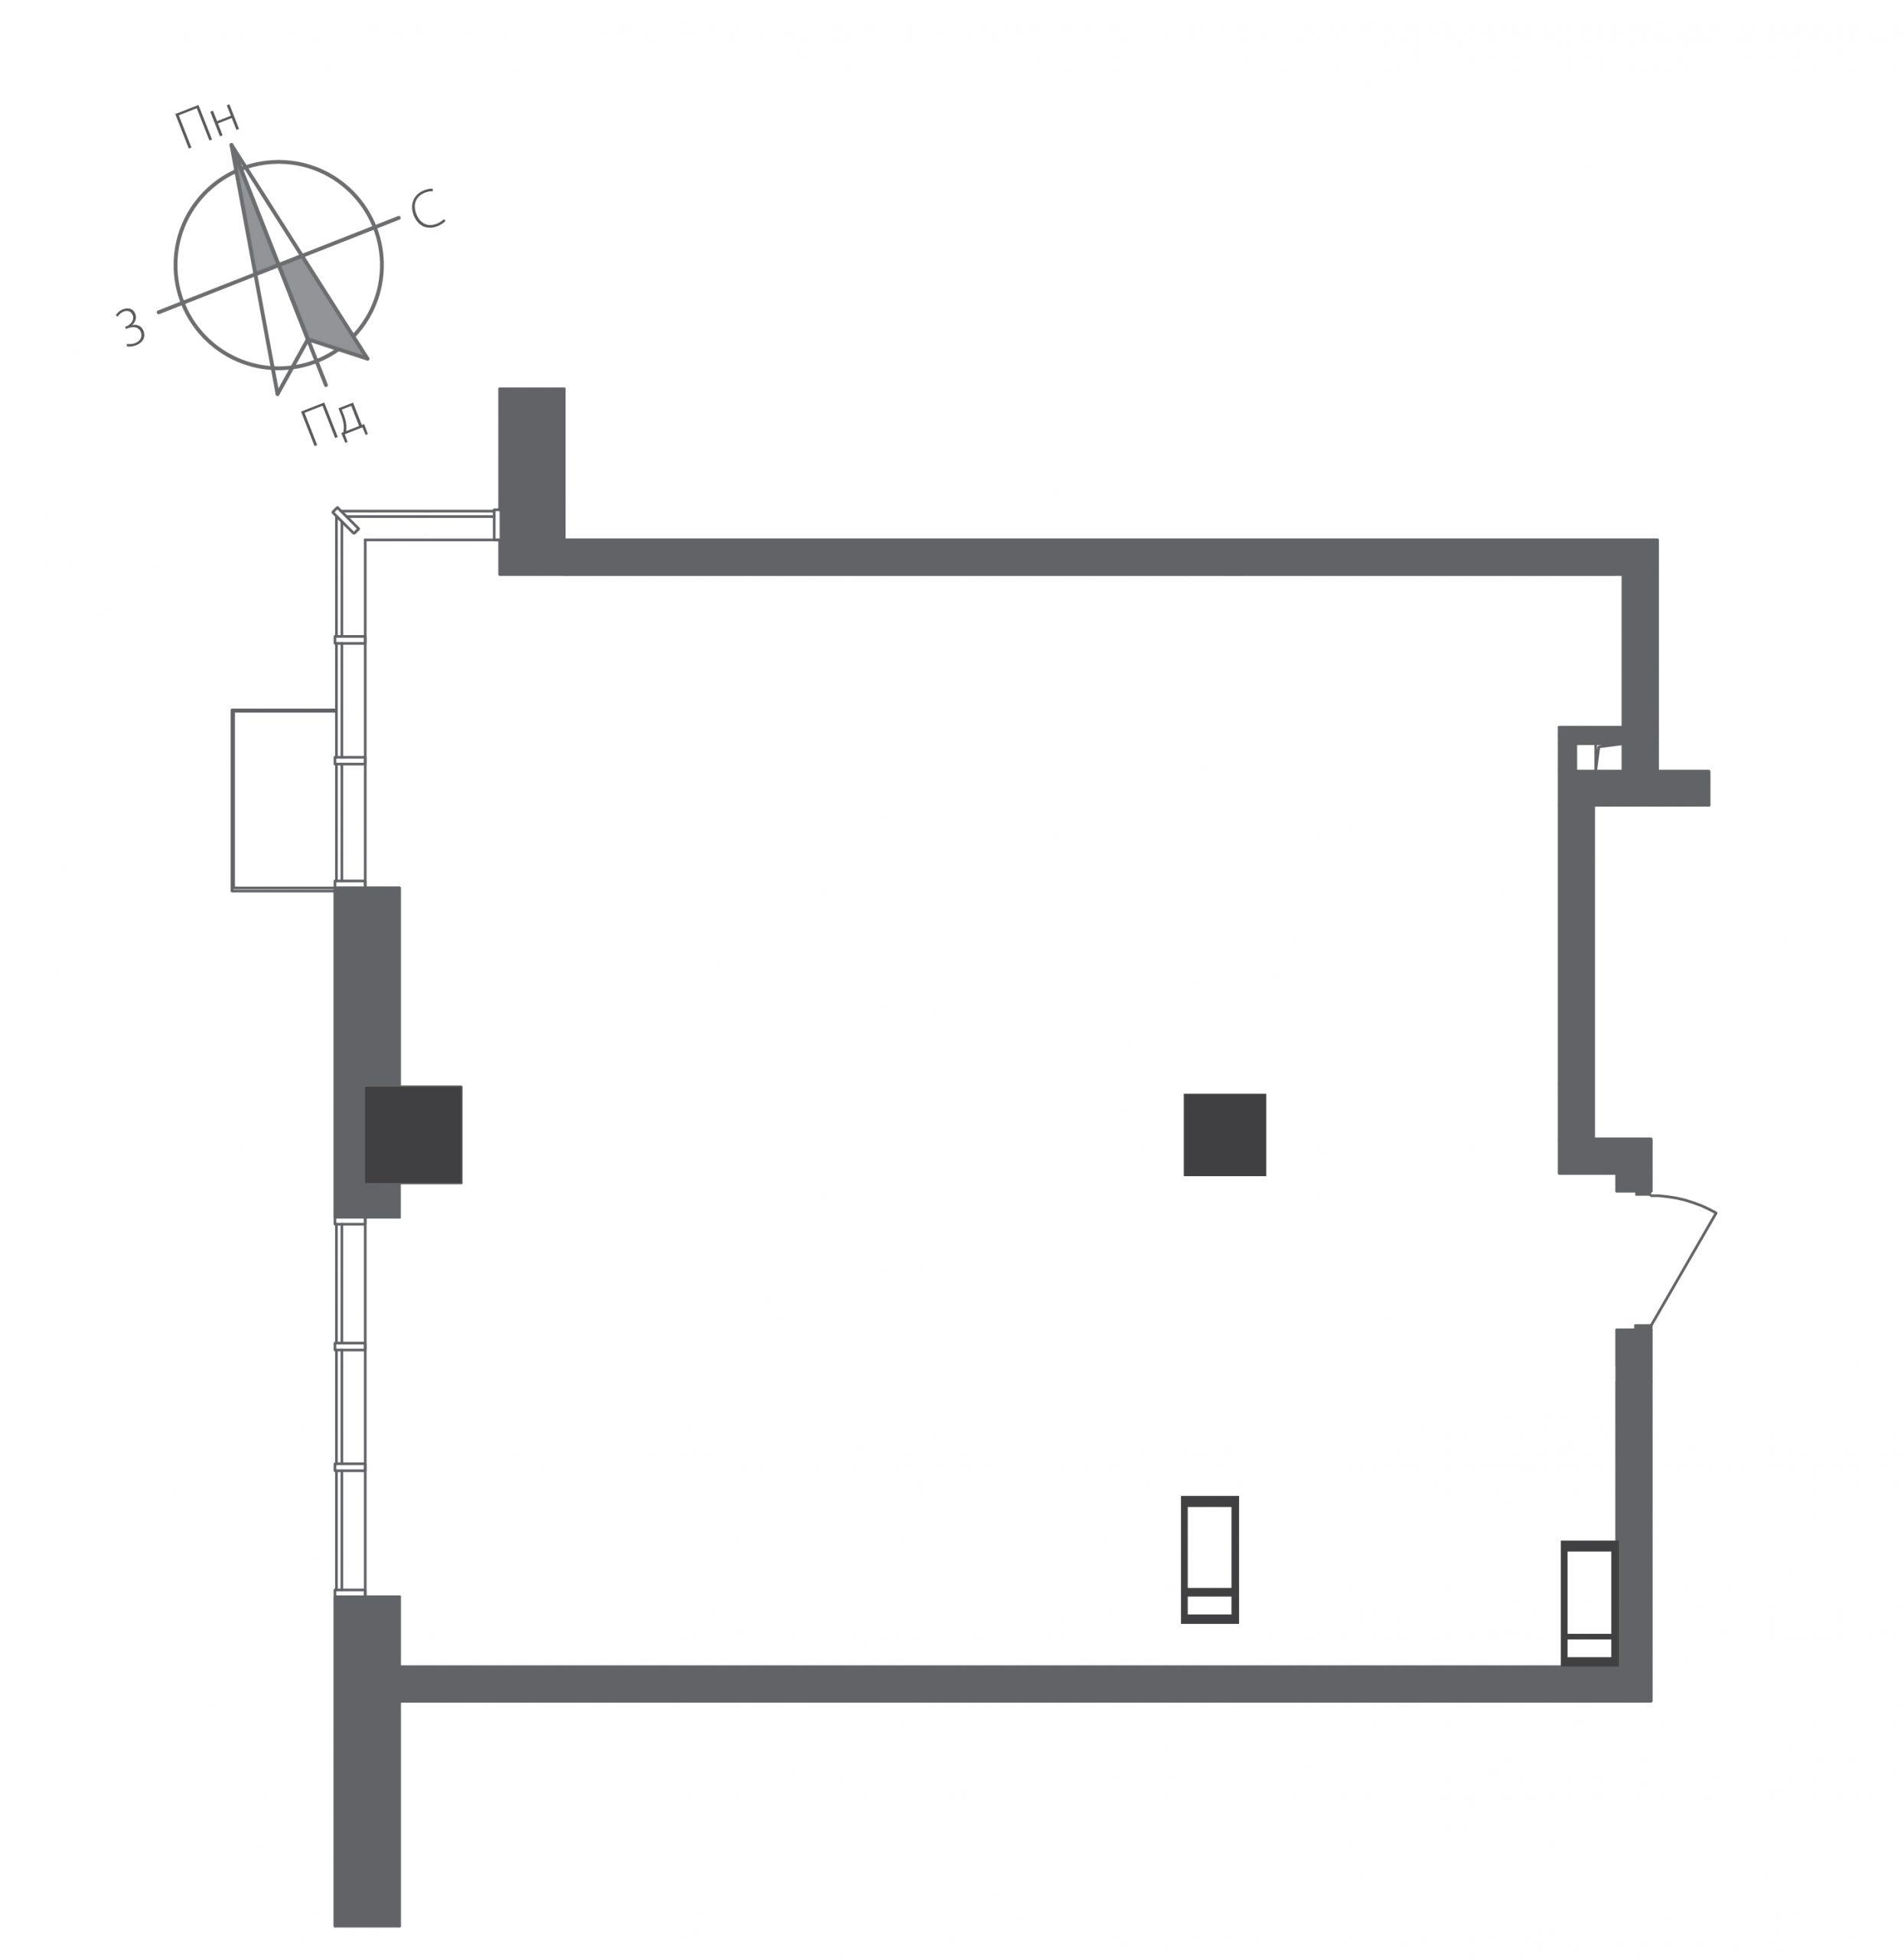 Однокімнатна квартира в ЖК RiverStone Номер квартири №15, Будинок 9, Поверх 15, Повна площа 66,88